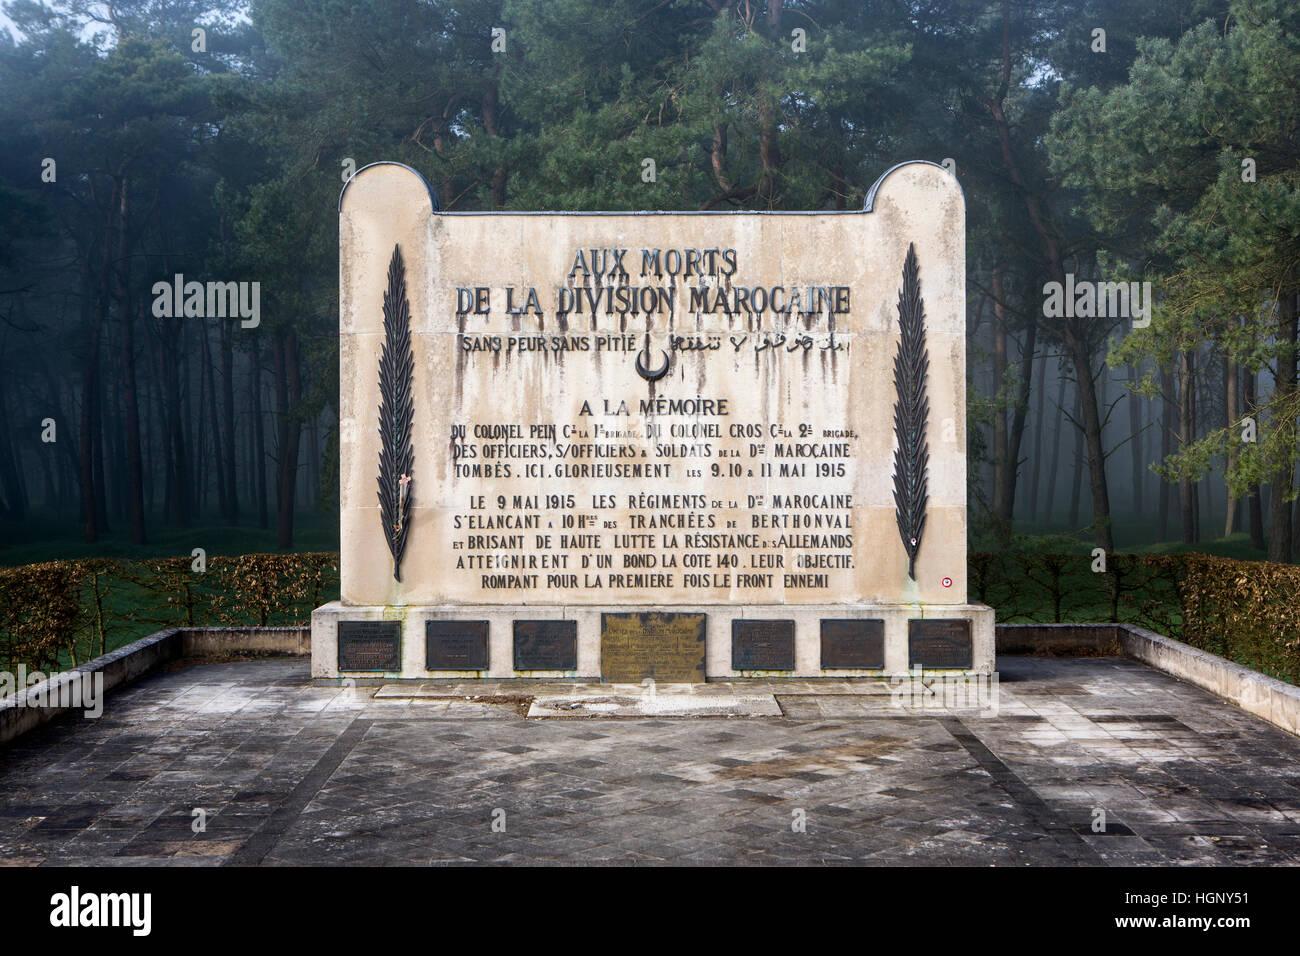 Moroccan War Memorial, Arras, France. - Stock Image